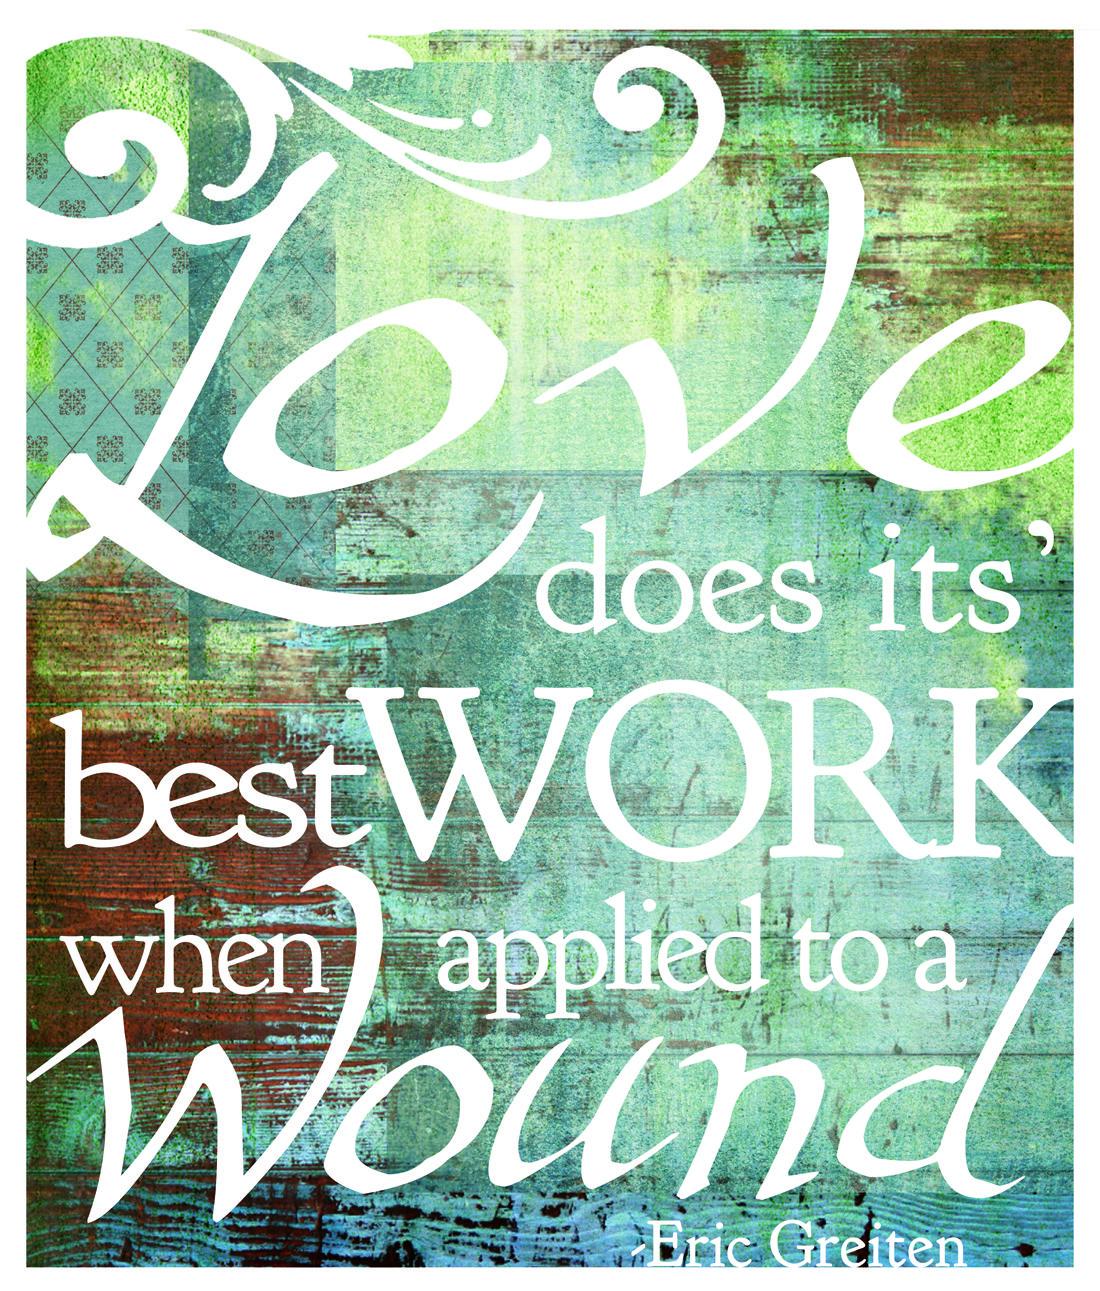 Love heals... Eric Greiten/Rebekah Blocher